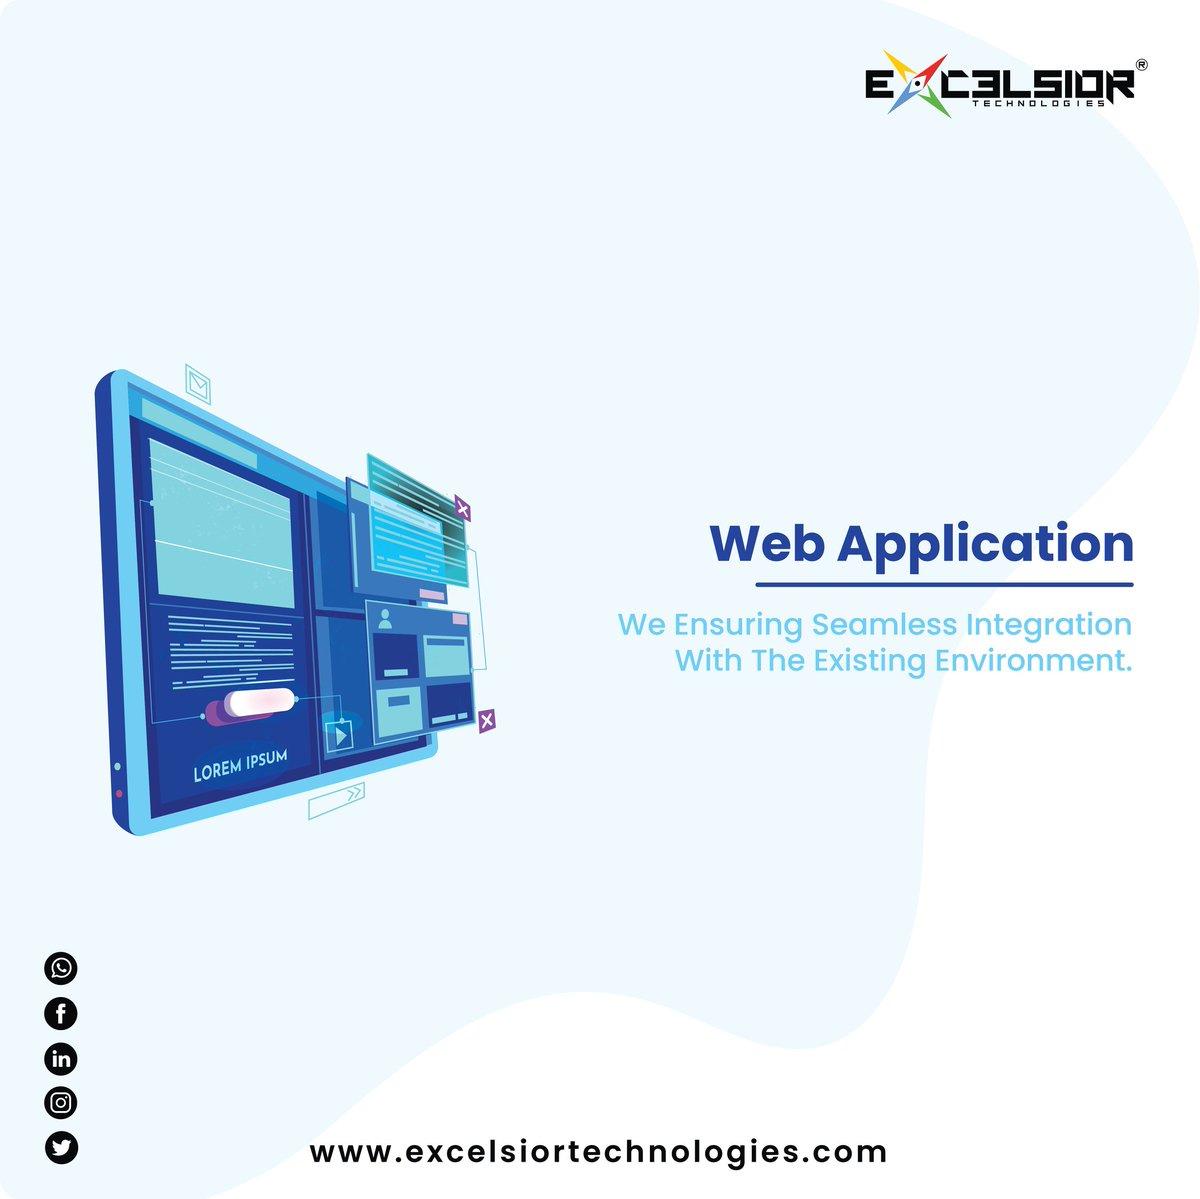 #WebApplication |We ensuring seamless integration with the existing environment.  Skype: excelsiortechnologies Email: info@excelsiortechnologies.com Portfolio: https://t.co/RtkshboWkz  #webapp #software #desktopapplication #restaurant #cafe #payroll #billing #HRMS #CRM #megamart https://t.co/K7ytX9PSX4